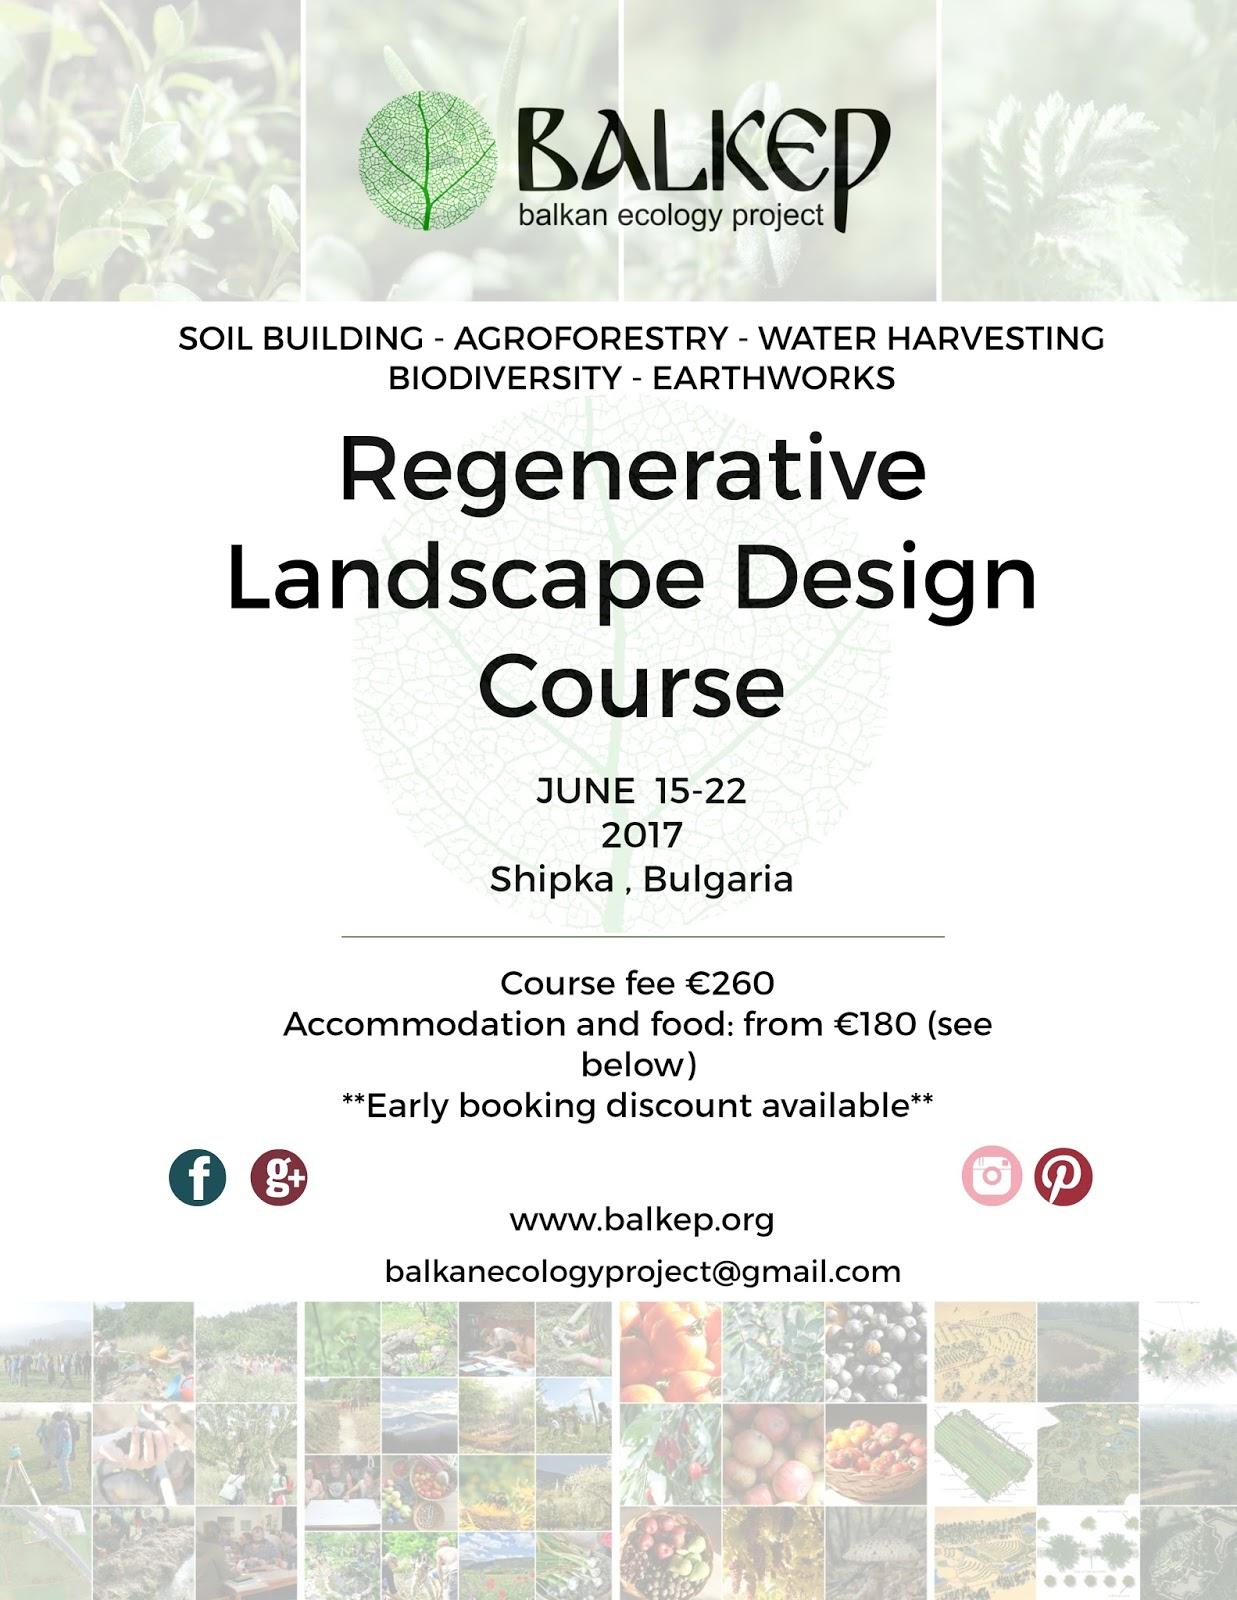 Balkan ecology project preparation for the regenerative for Landscape design training